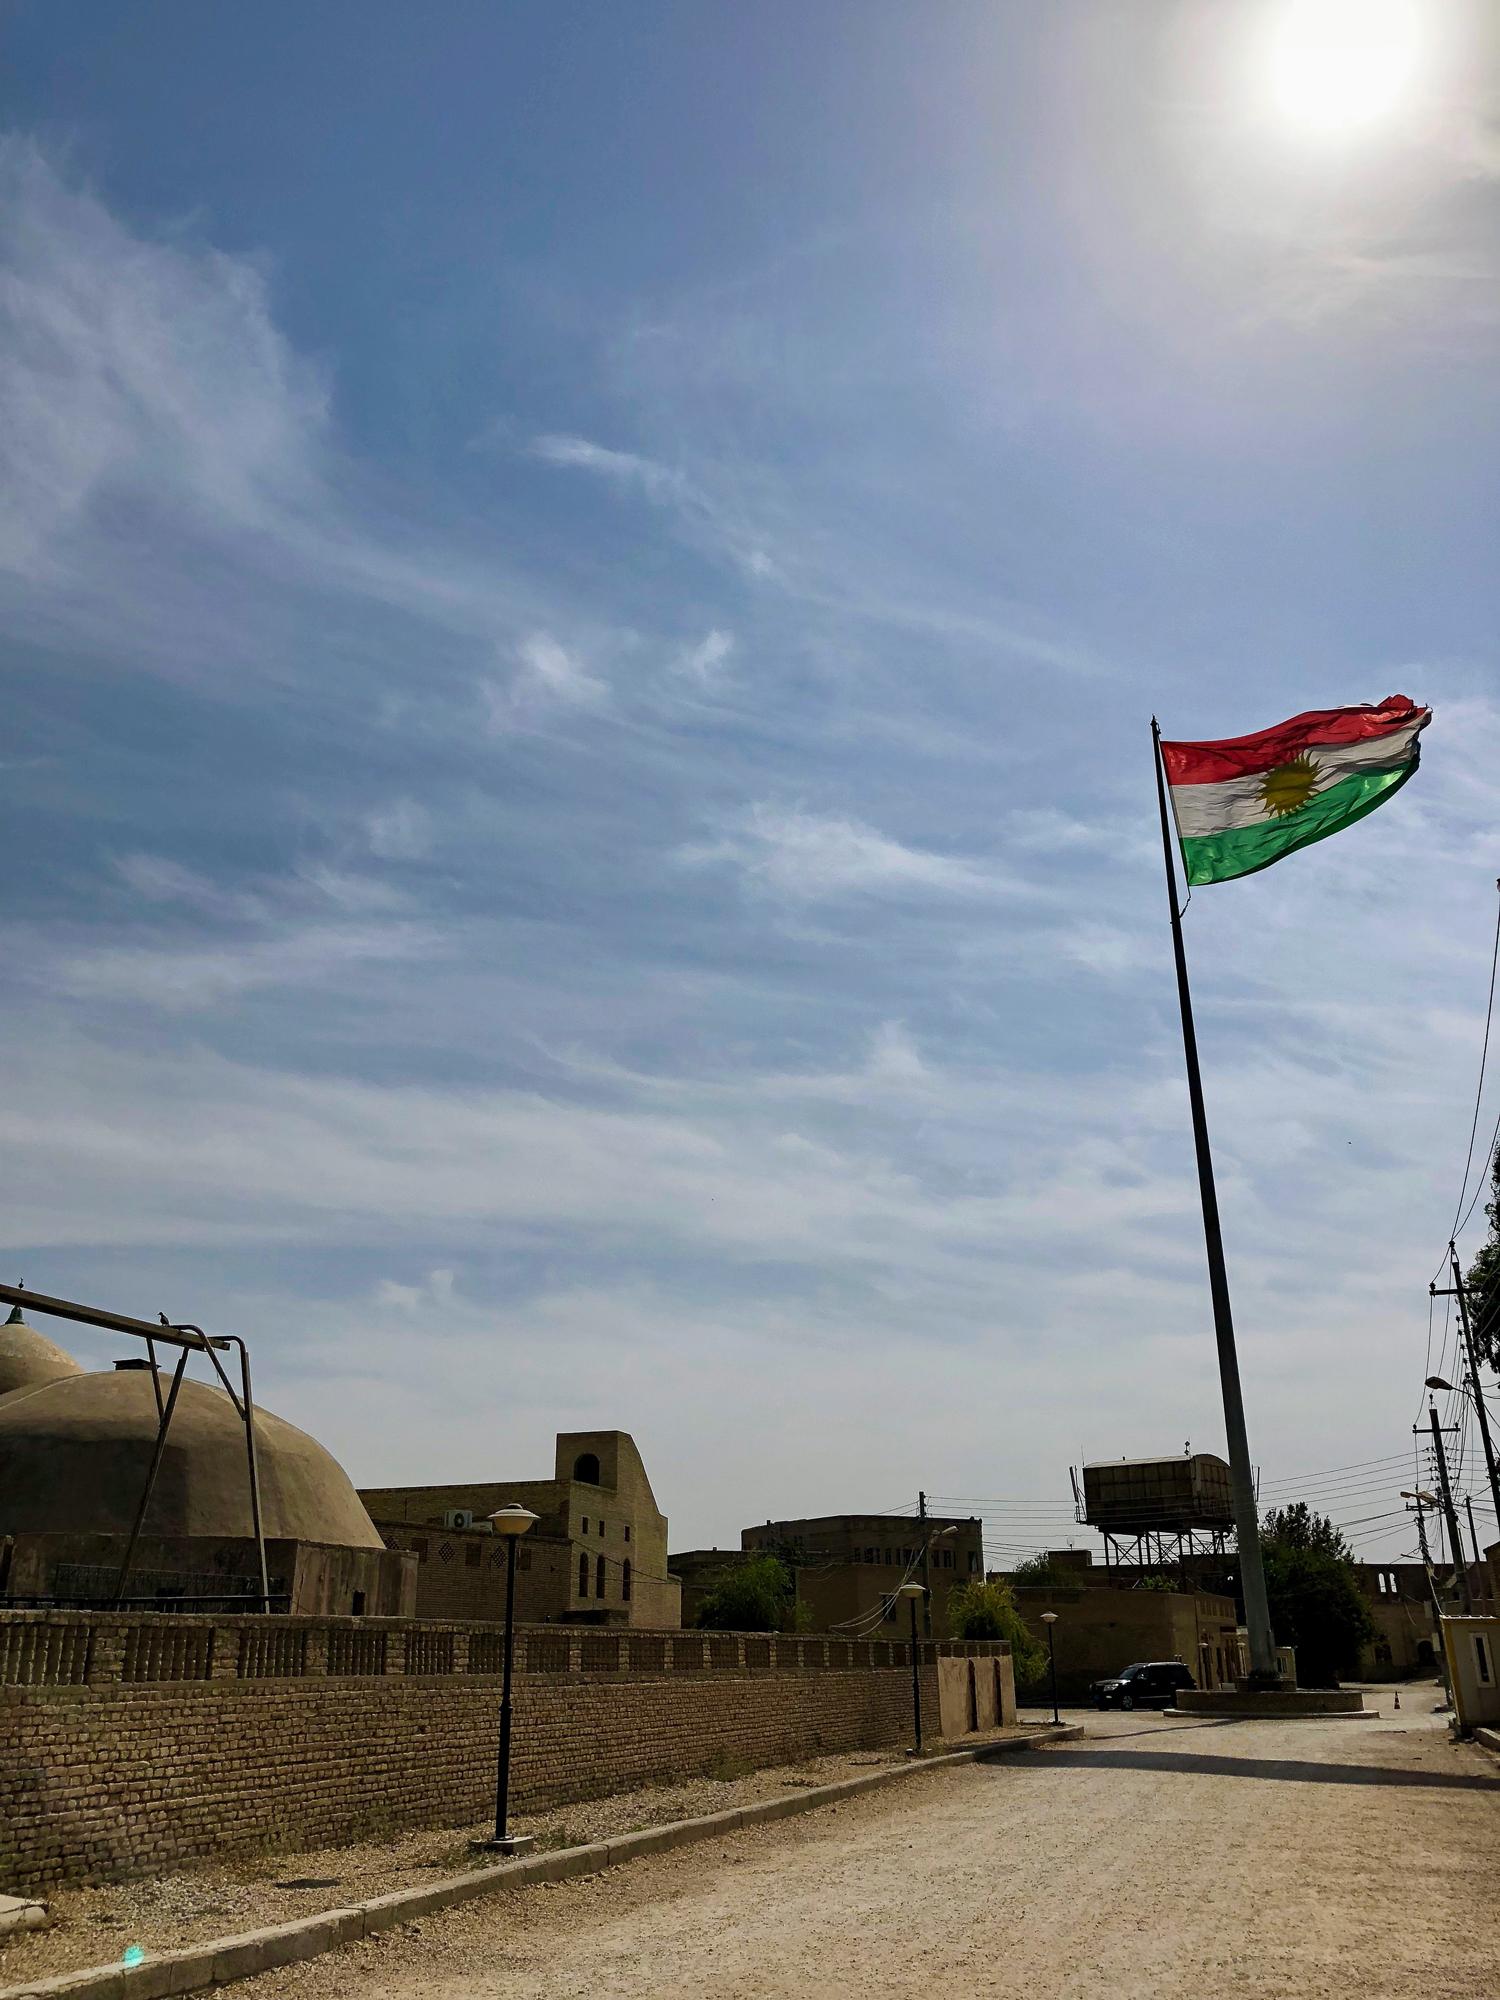 Inside the citadel of Erbil